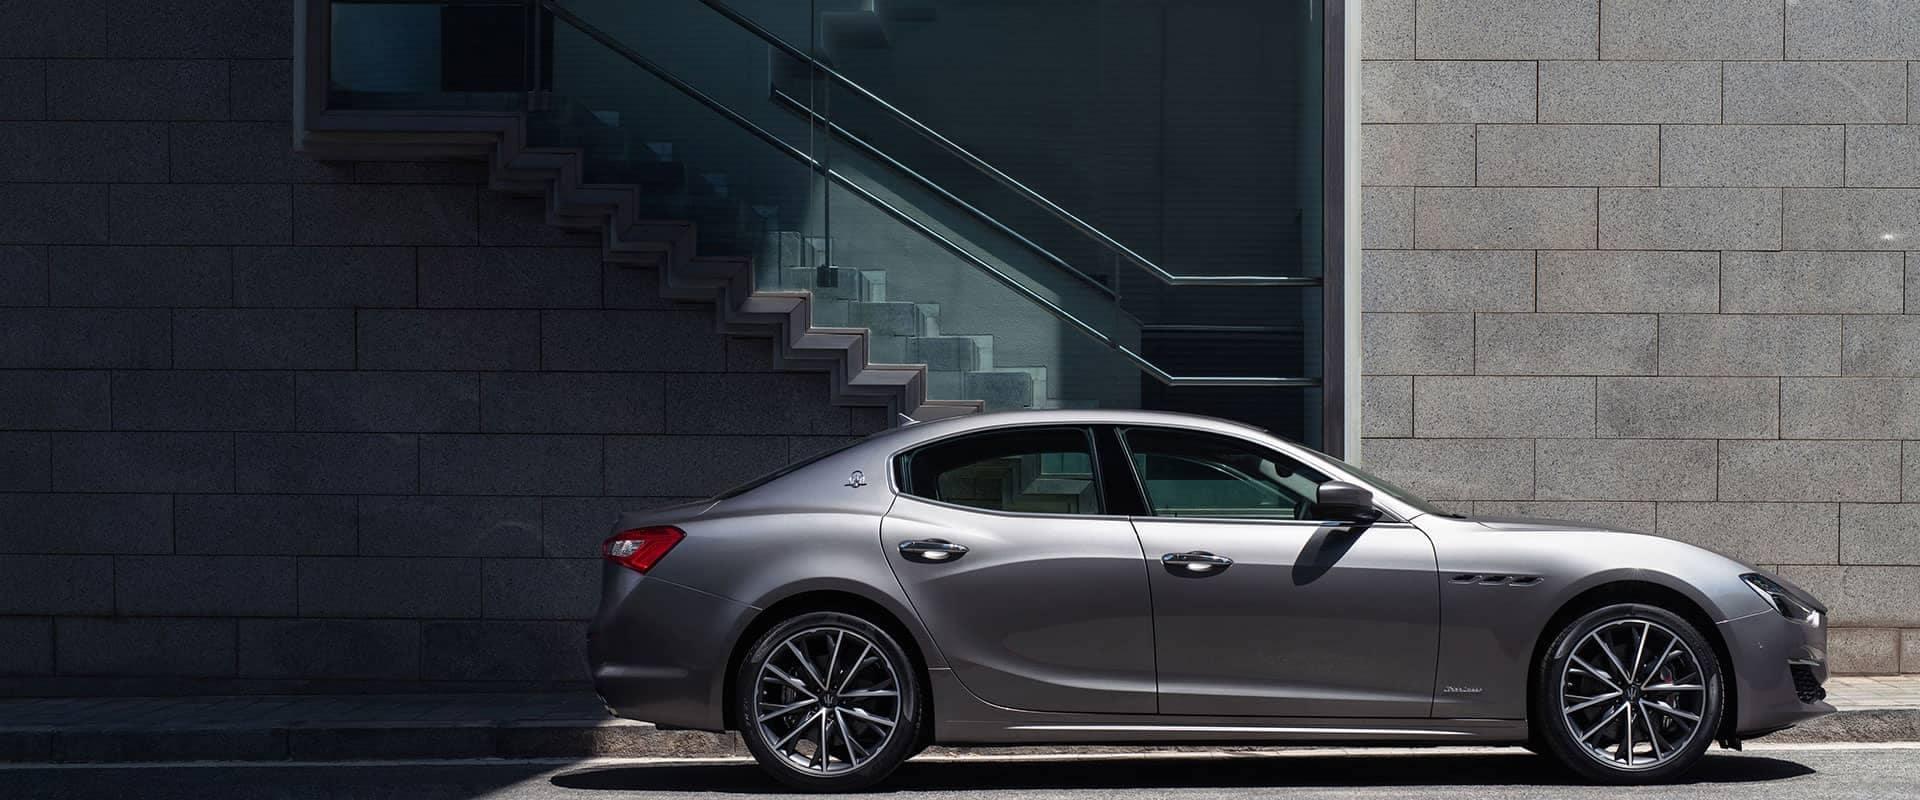 2019-Maserati-Ghibli-2